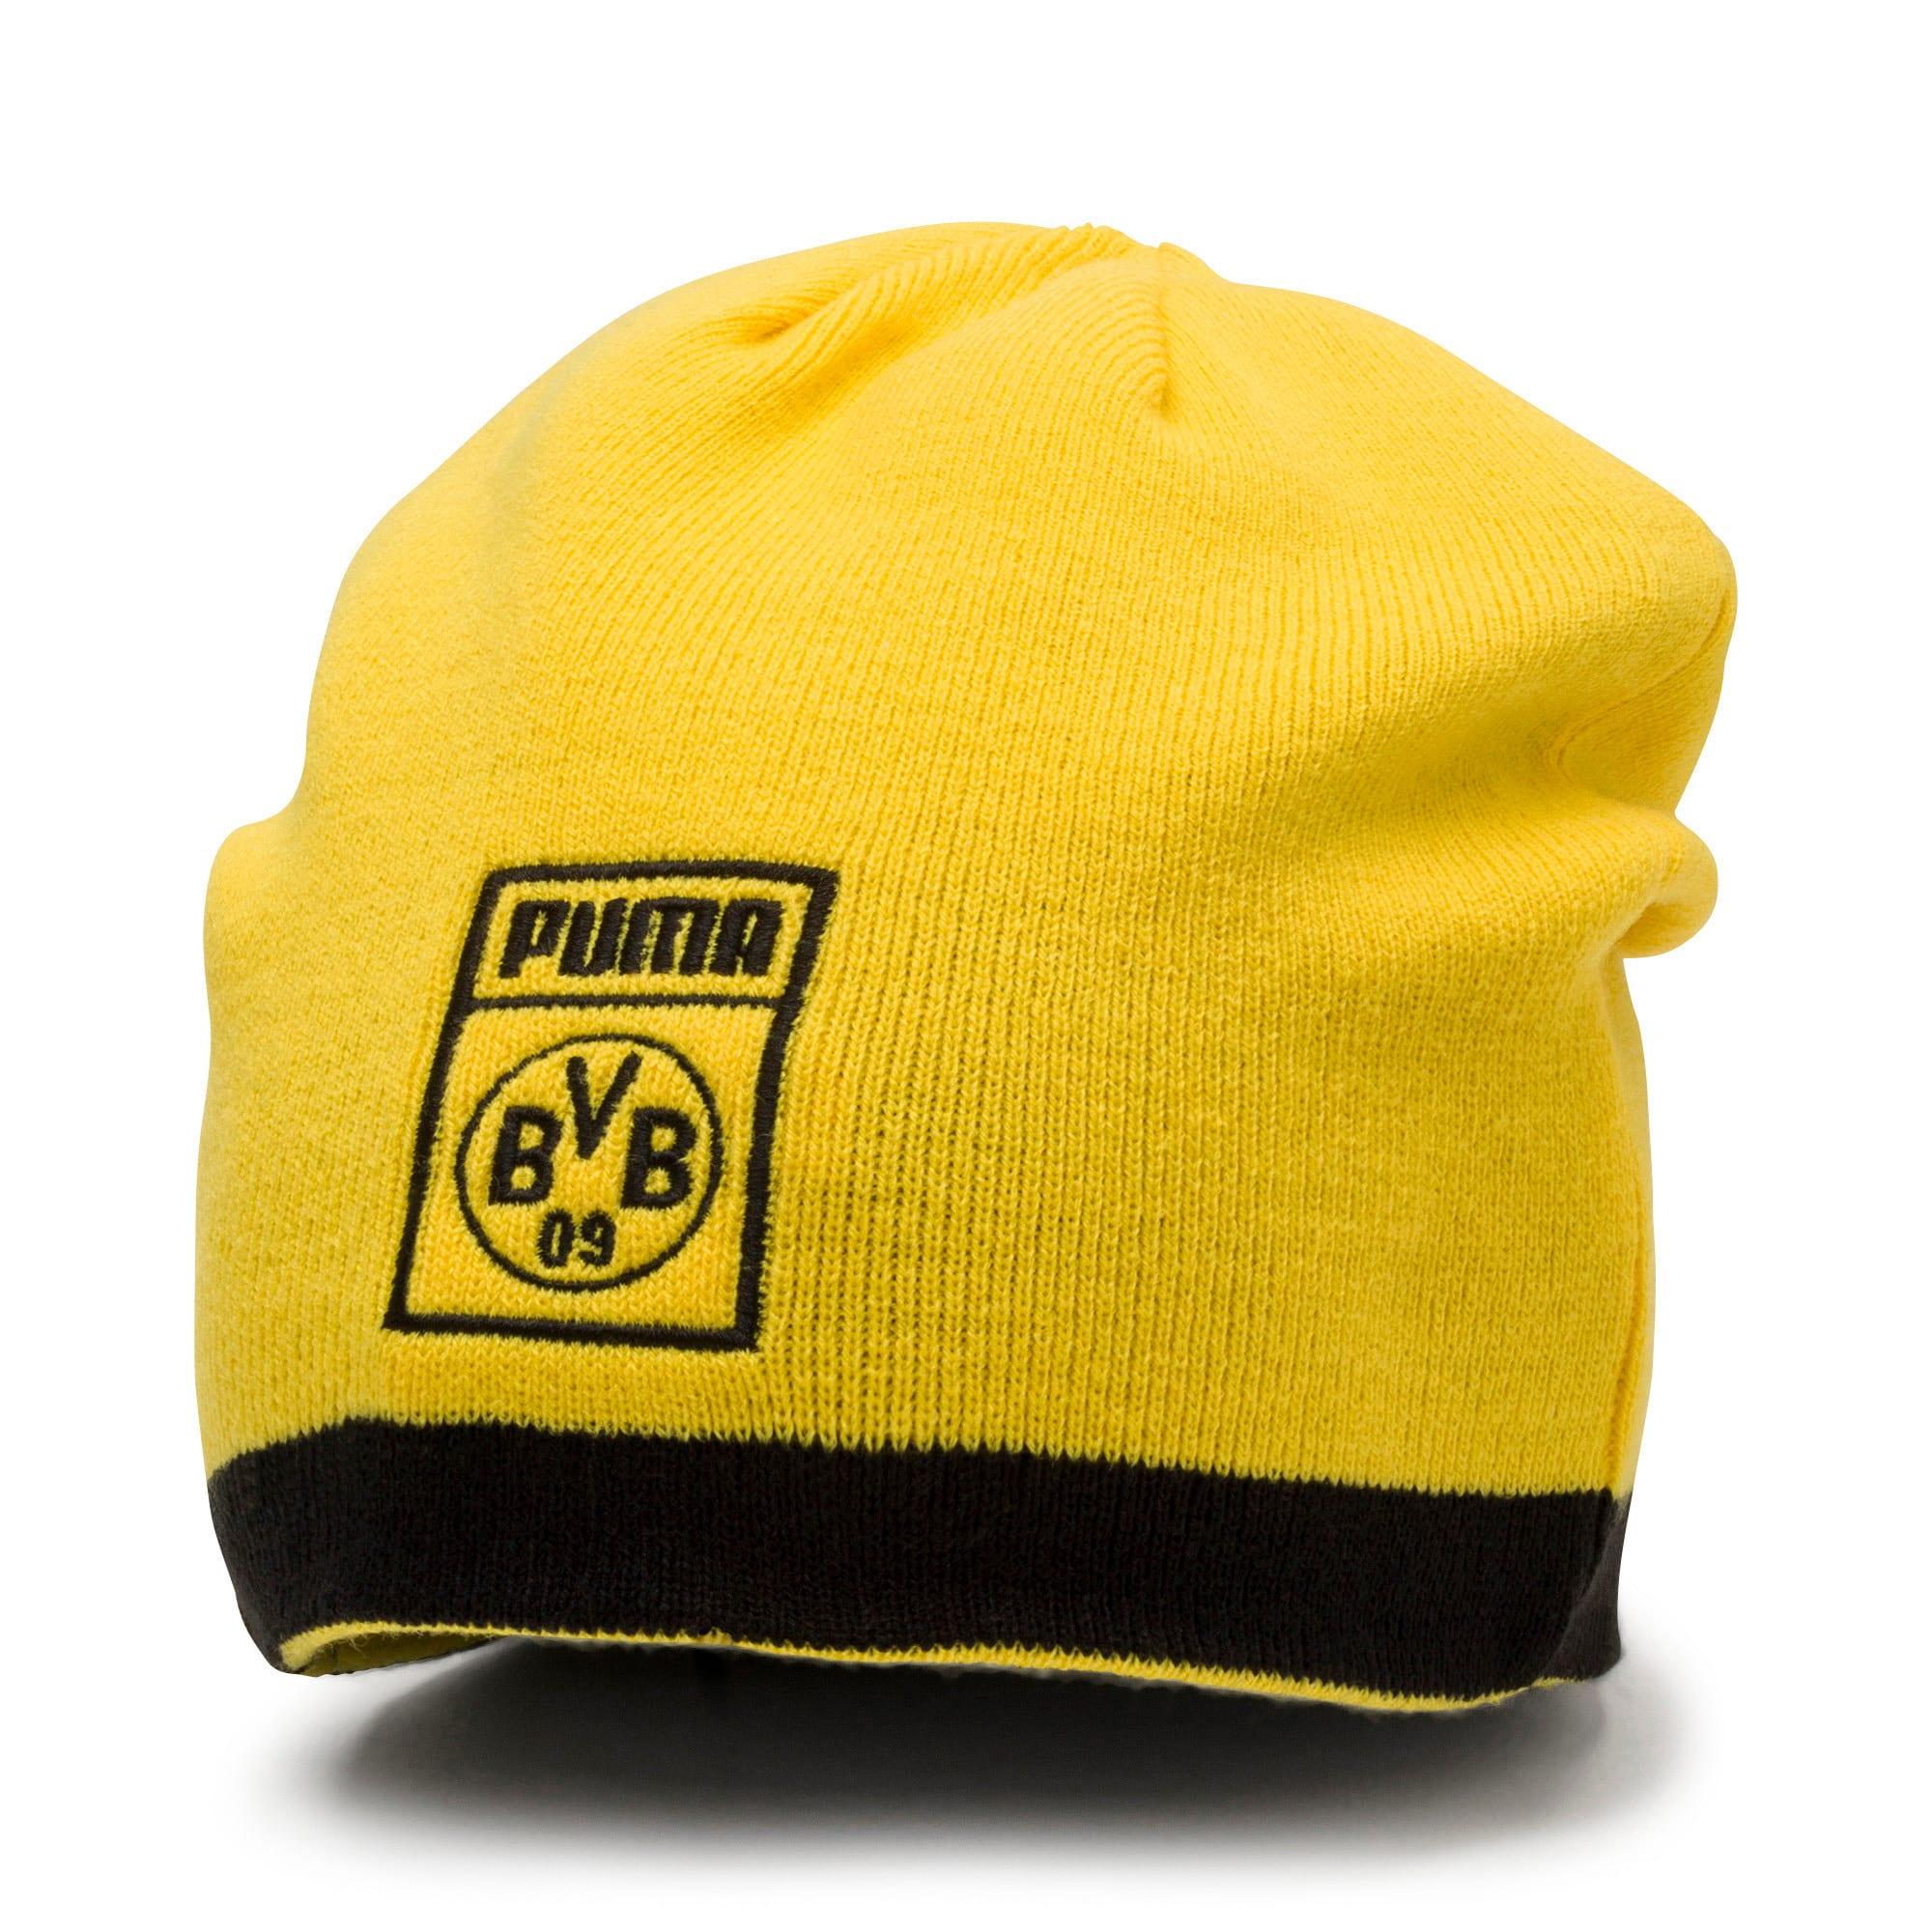 Thumbnail 1 of BVB Reversible Beanie, Puma Black-Cyber Yellow, medium